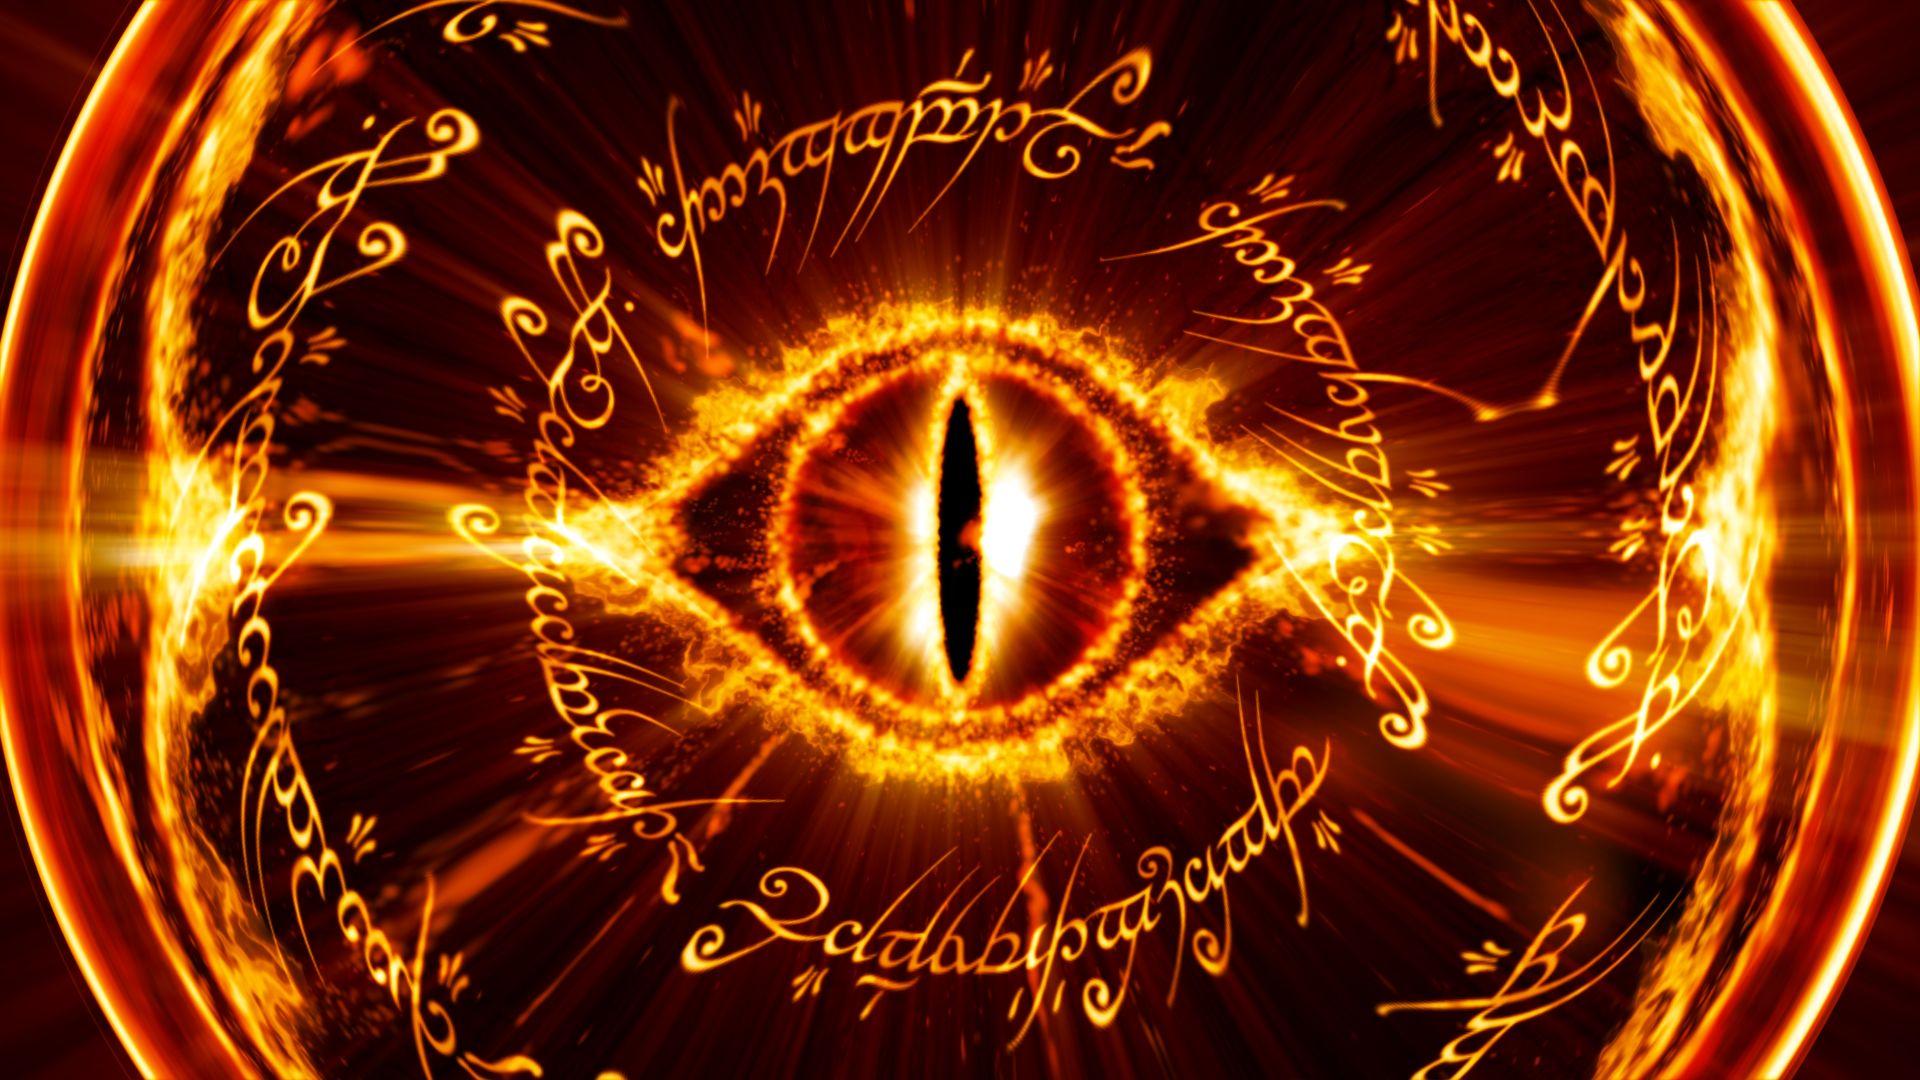 the_eye_of_sauron_by_stirzocular-d86f0oo.jpg (1920×1080) | Senhor dos  aneis, Planos de fundo, Terra média